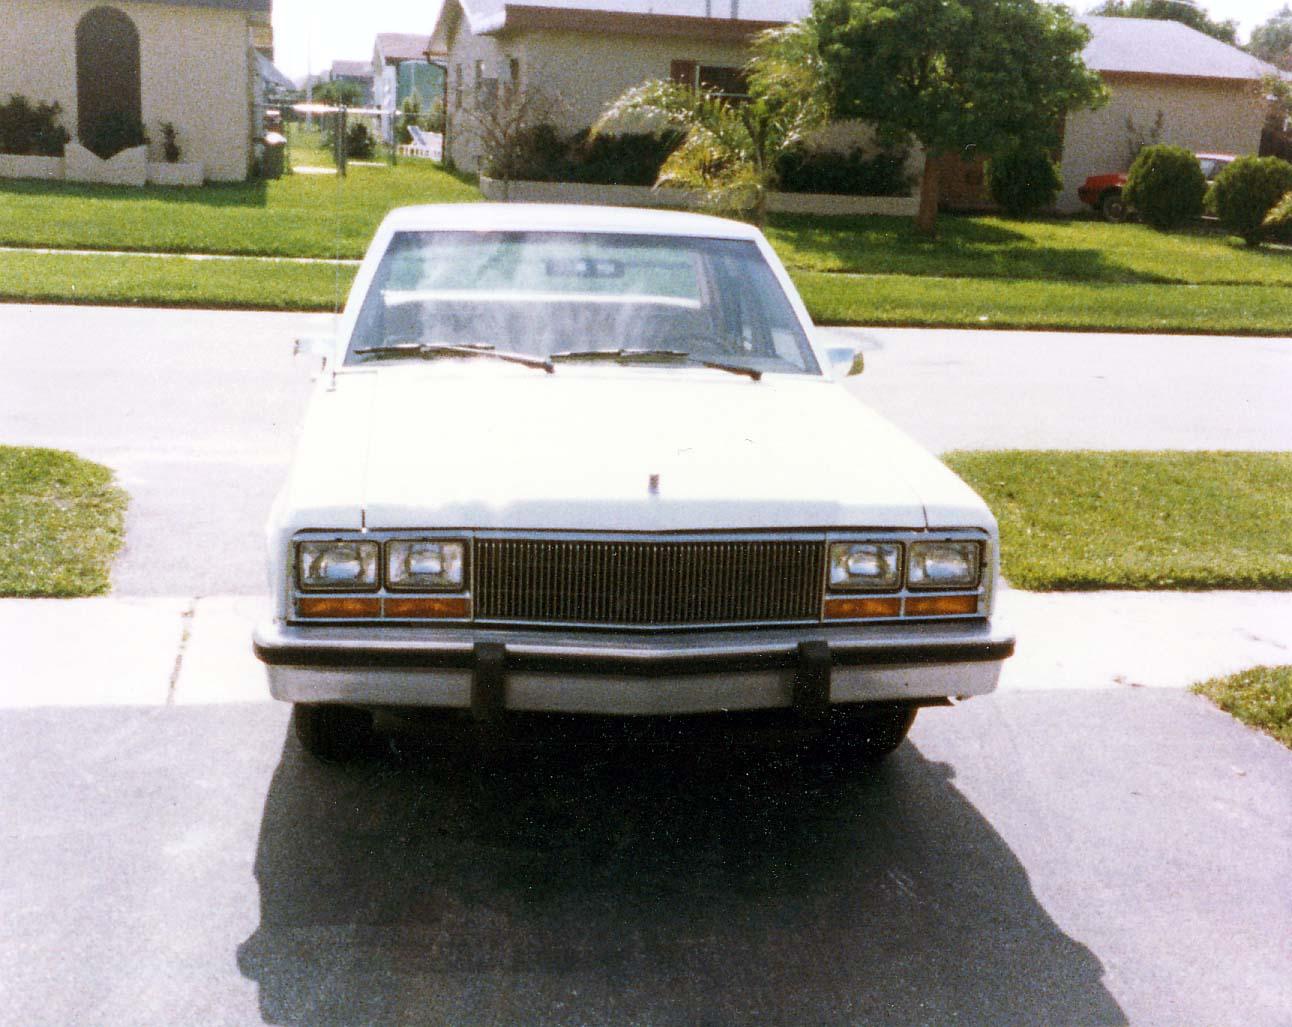 Coal 1979 Mercury Zephyr White Trash Curbside Classic